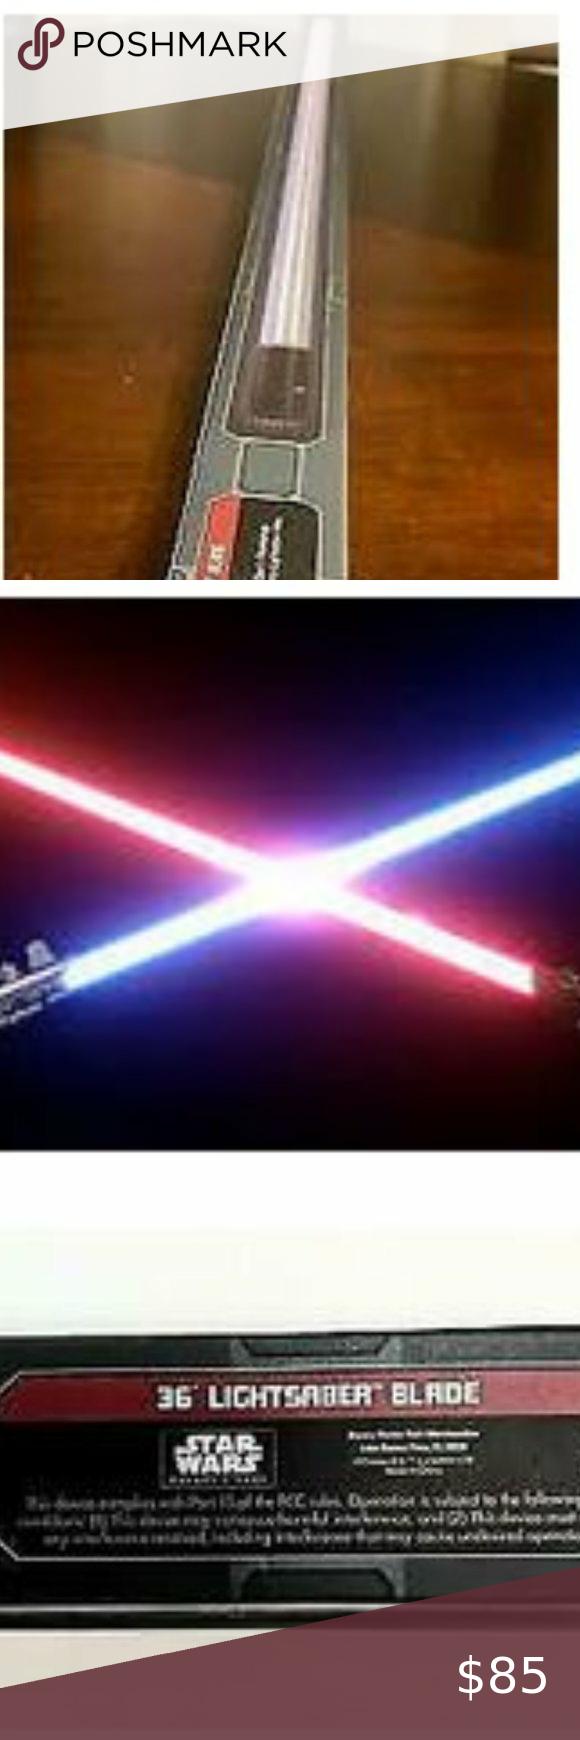 Star Wars Galaxy S Edge 36 Lightsaber Blade Star Wars Galaxies Lightsaber Star Wars